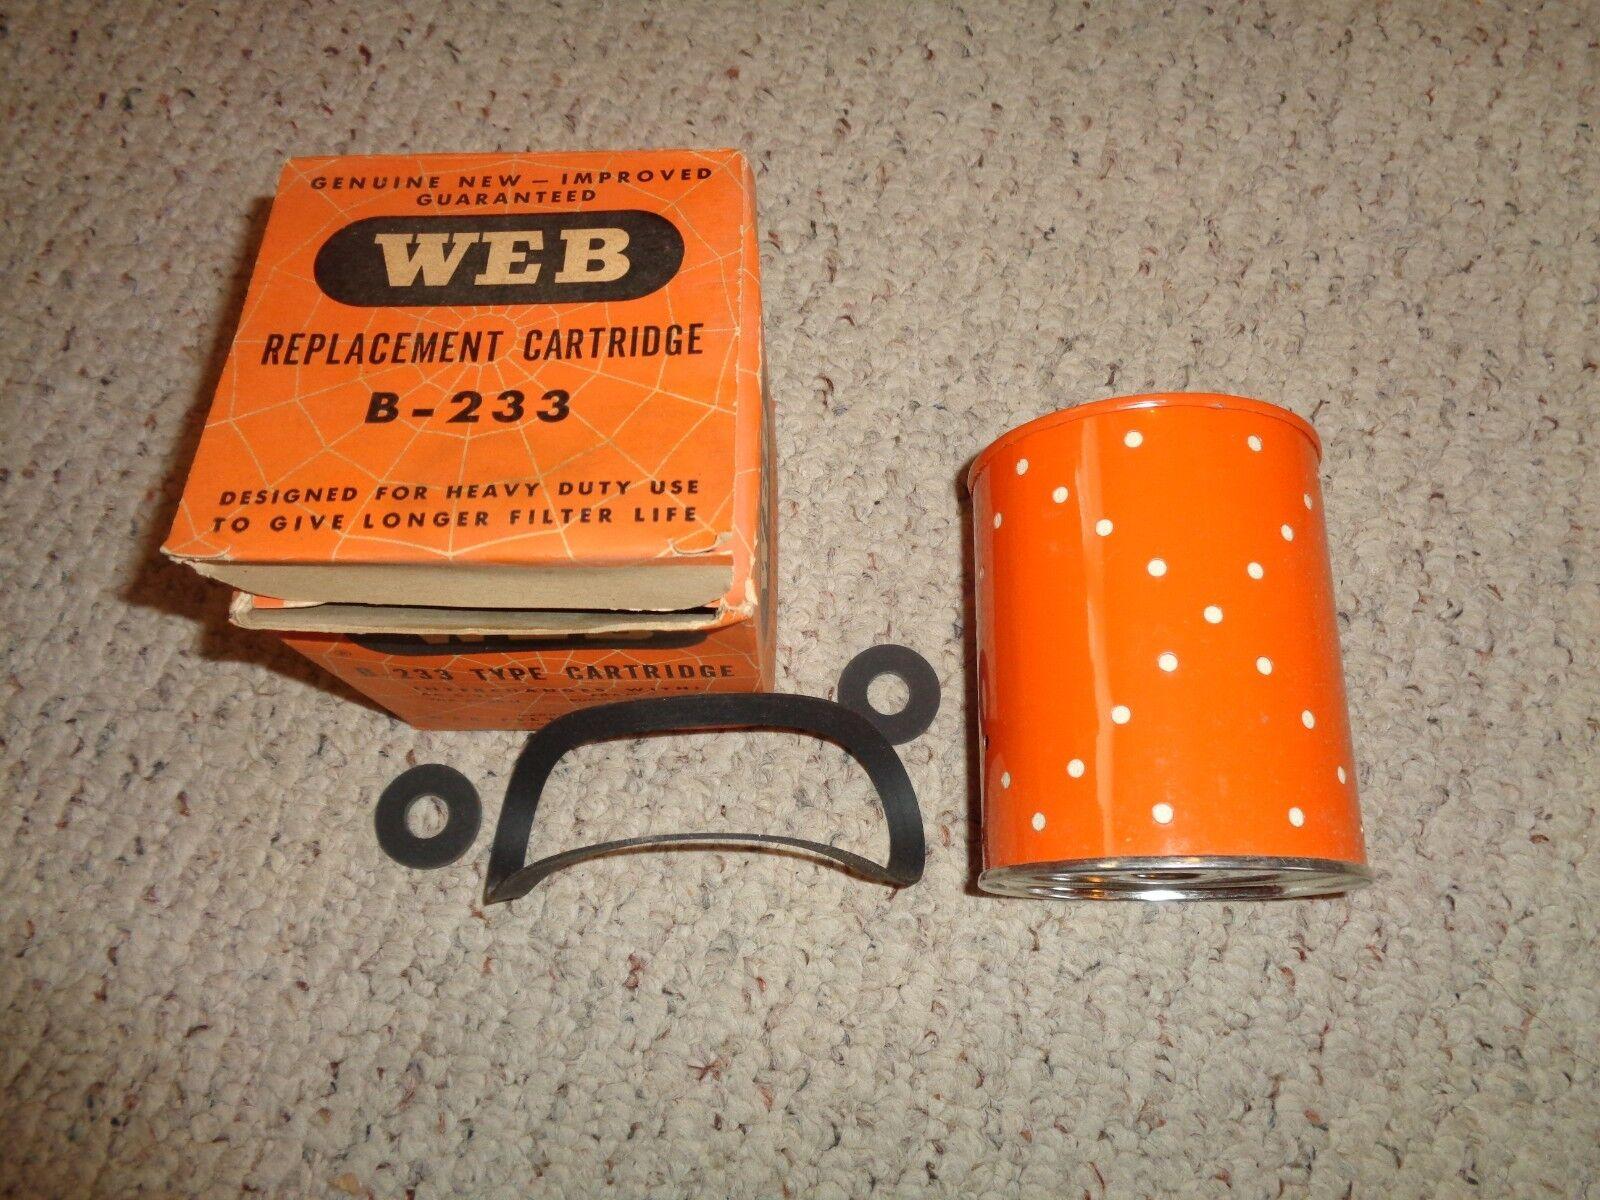 WEB B-233 oil filter FRAM C-130 AC C-301 NOS WEX PC-80-N PUROLATOR PN-15